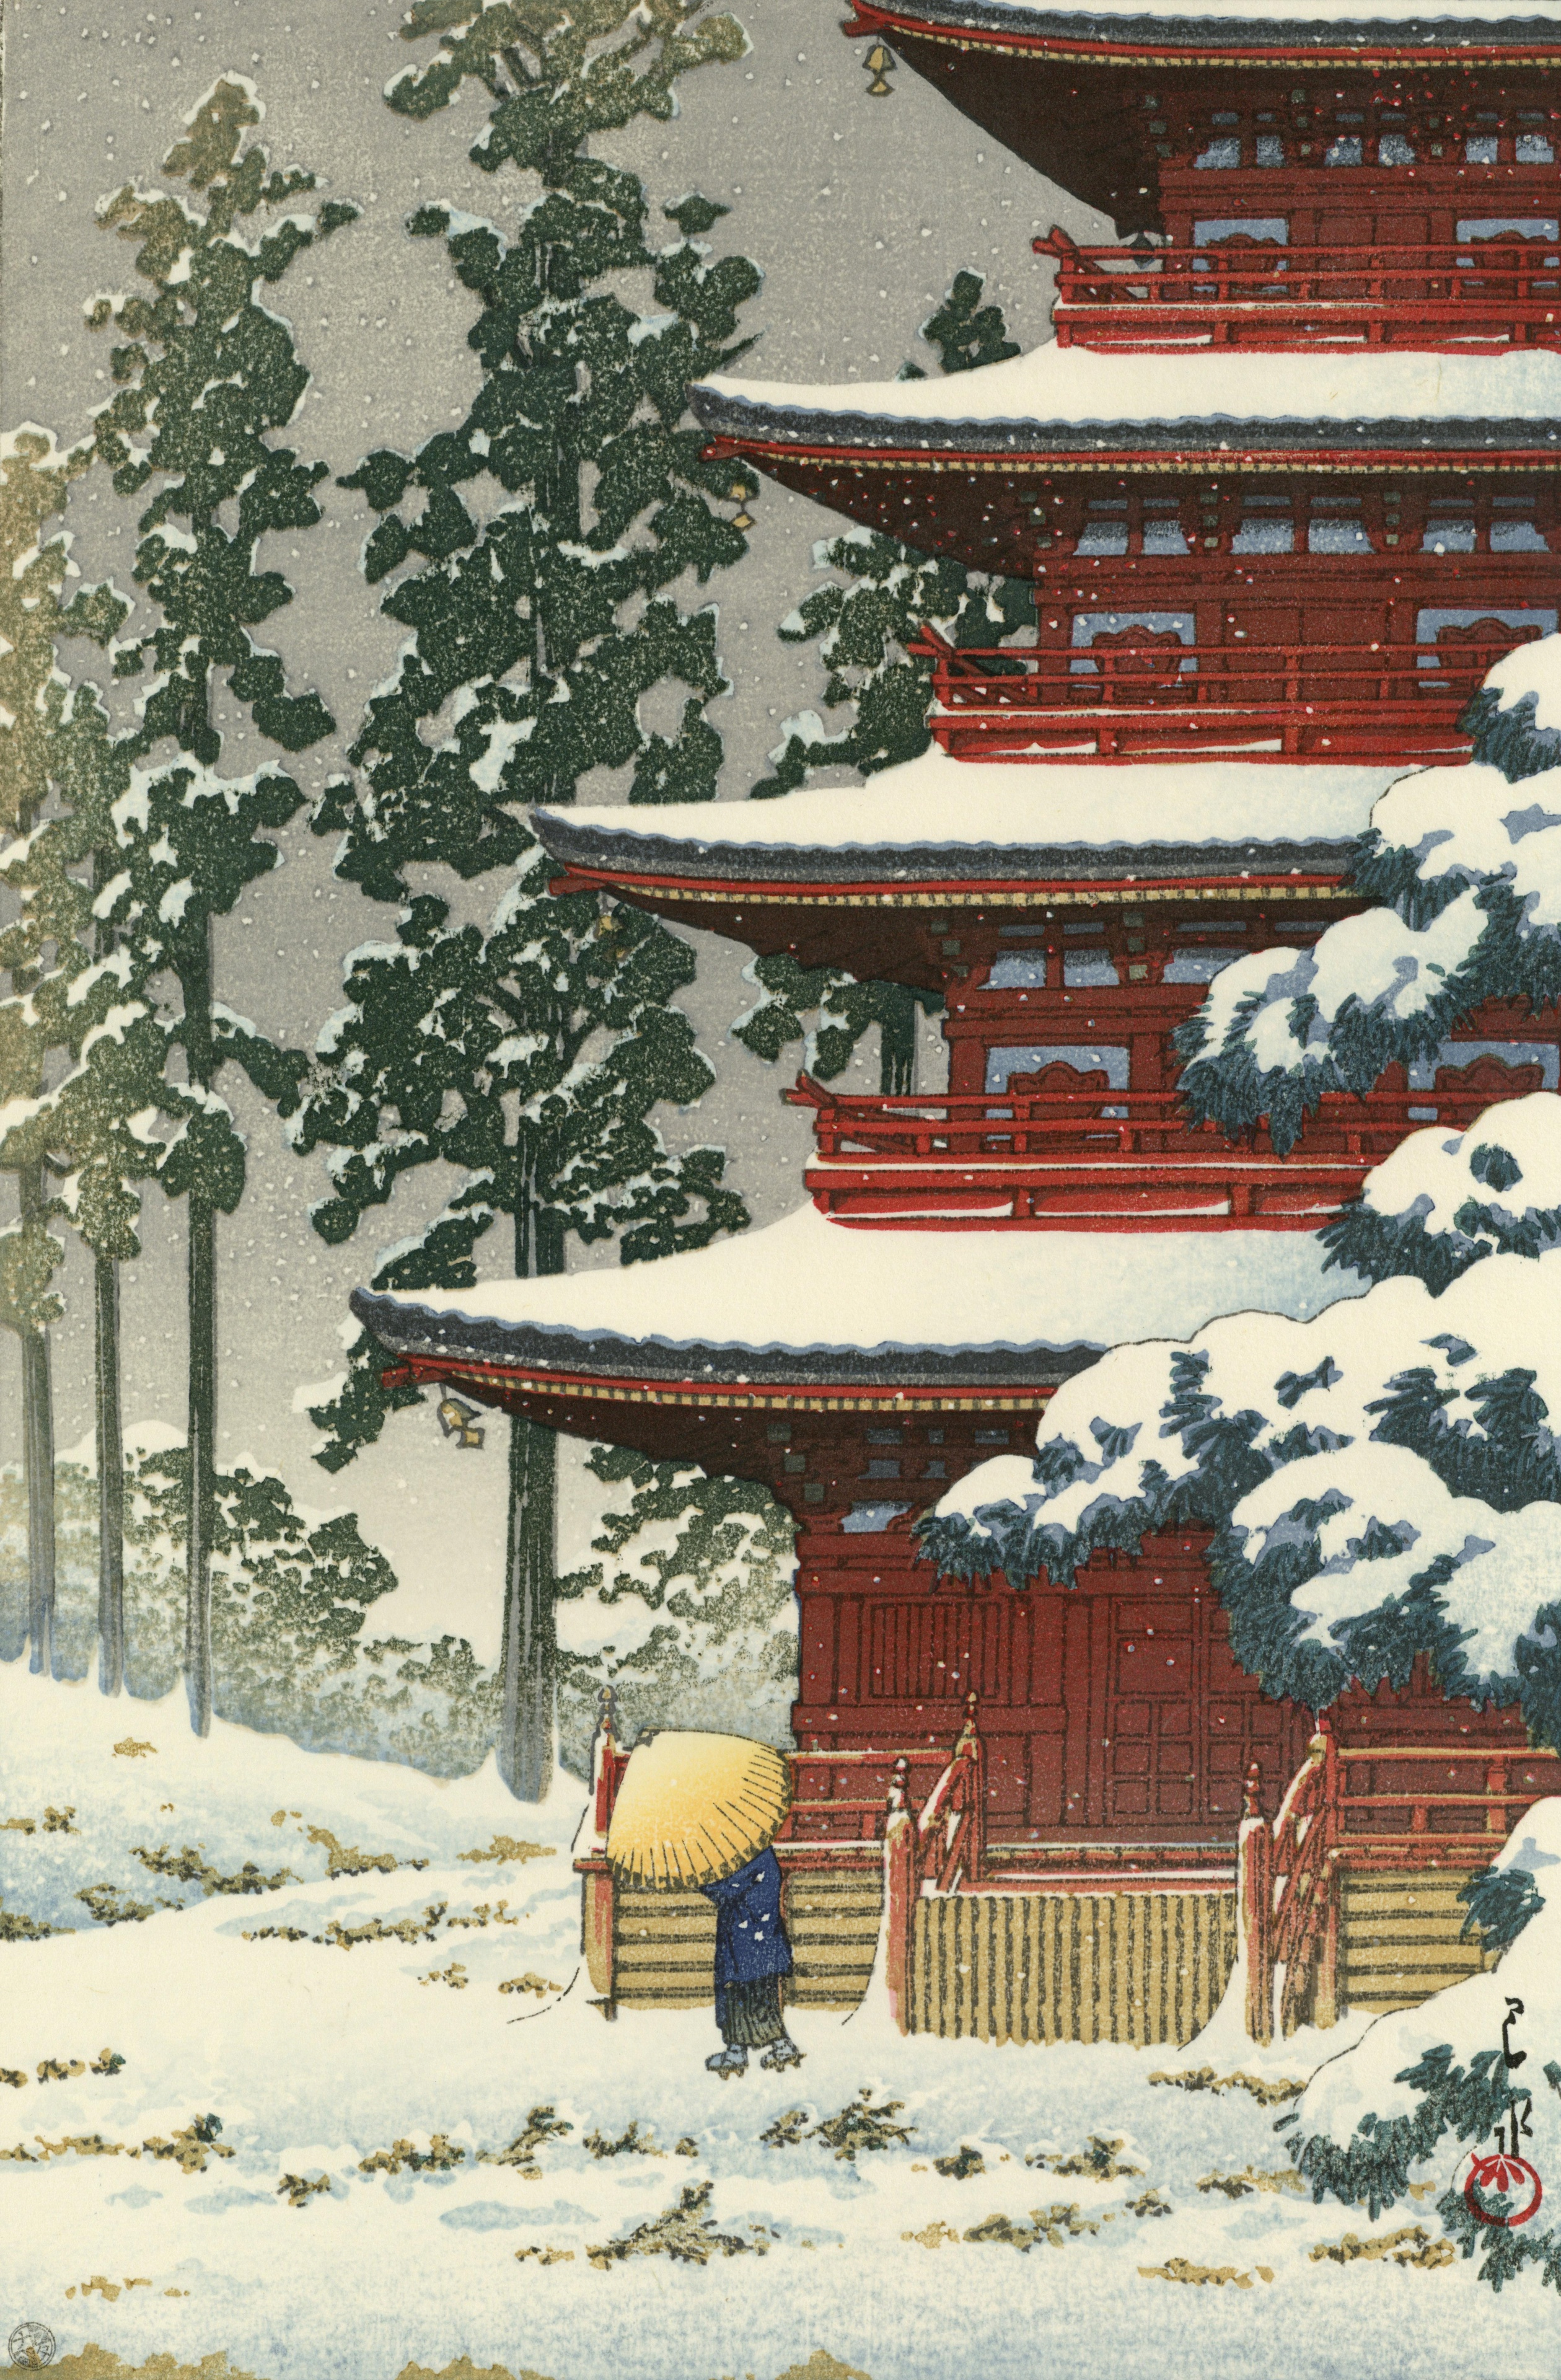 Original woodblock print – Hasui Kawase – Saishoin Temple in Snow, Hirosaki  – Heisei period (1989-present) | JAPANCIENT